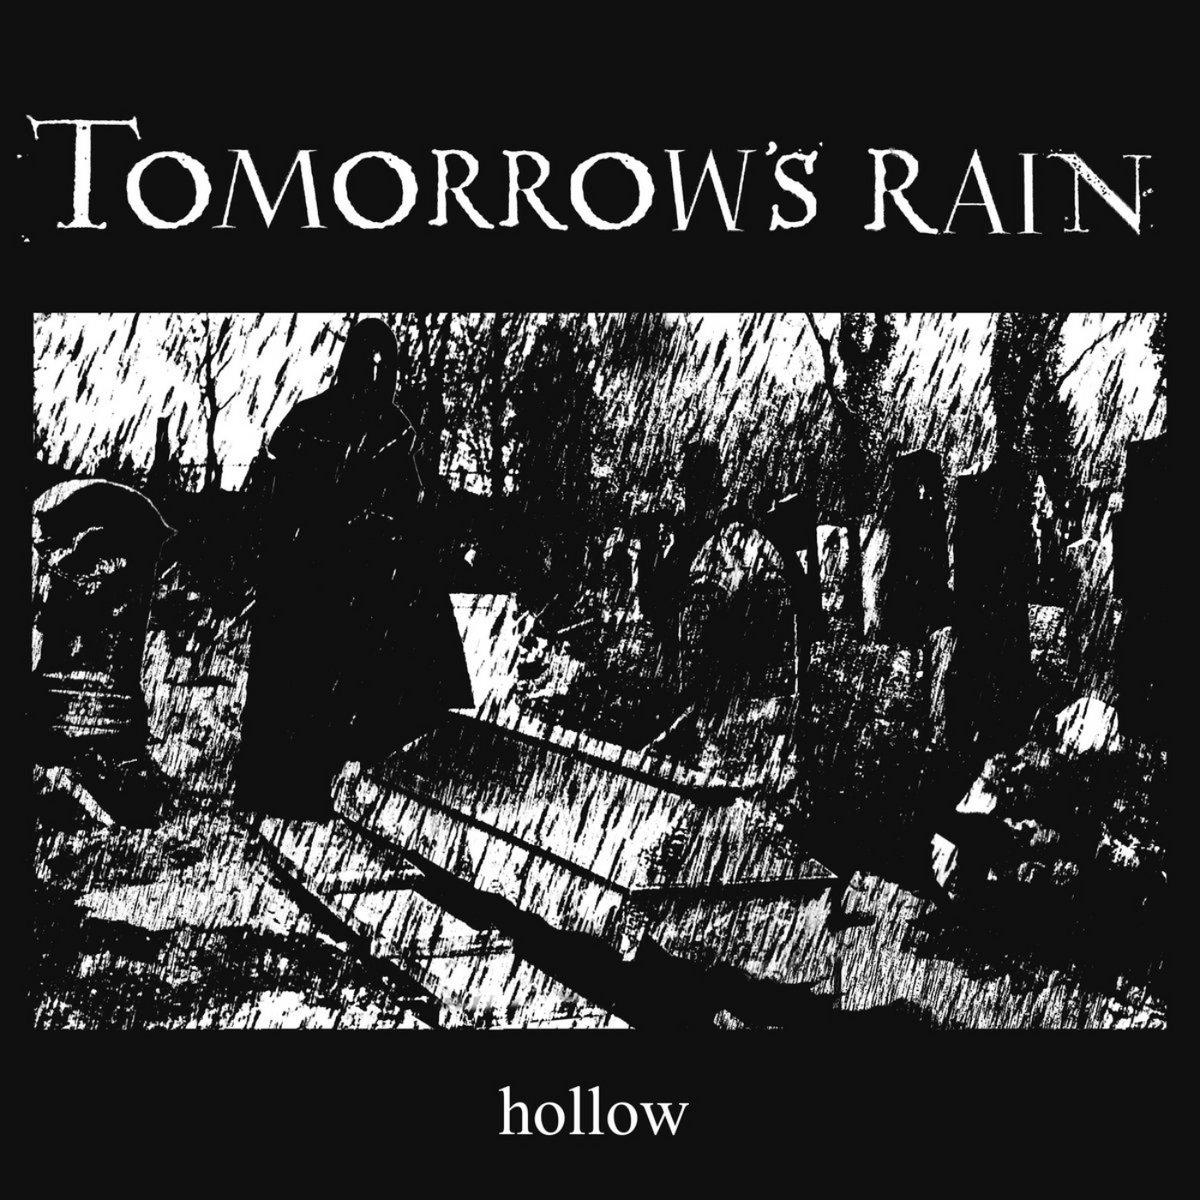 tomorrows rain hollow